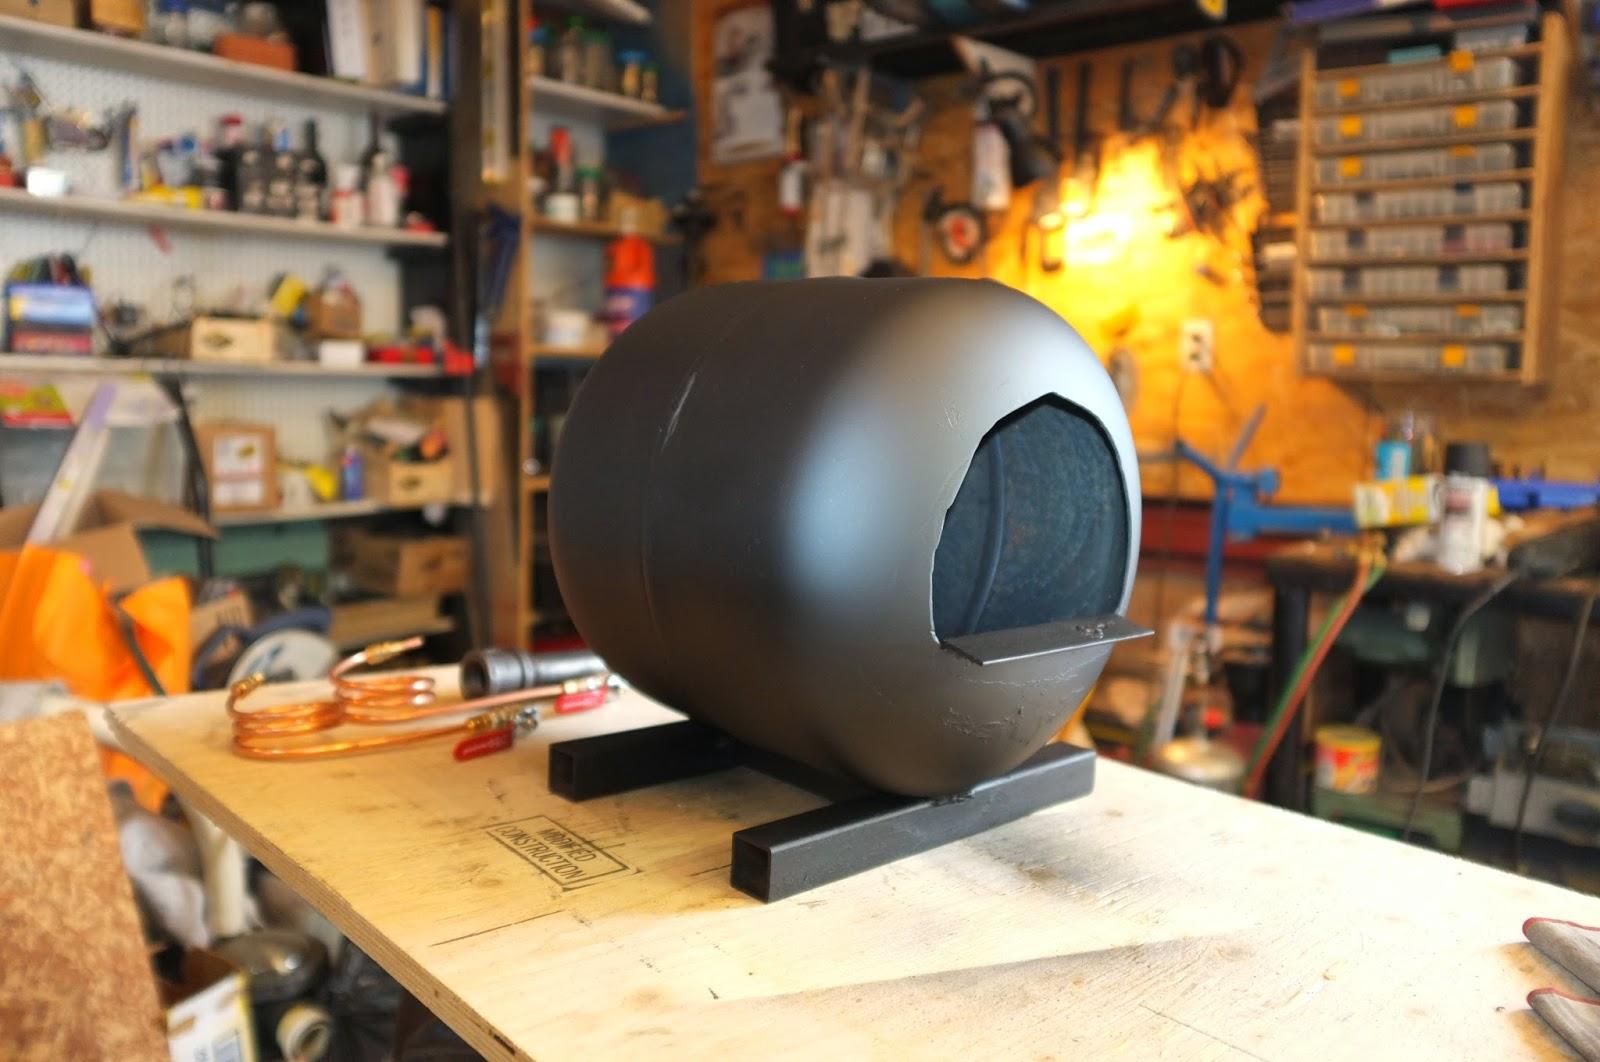 Blacksmith co forge au gaz partie 3 - Forge a gaz ...